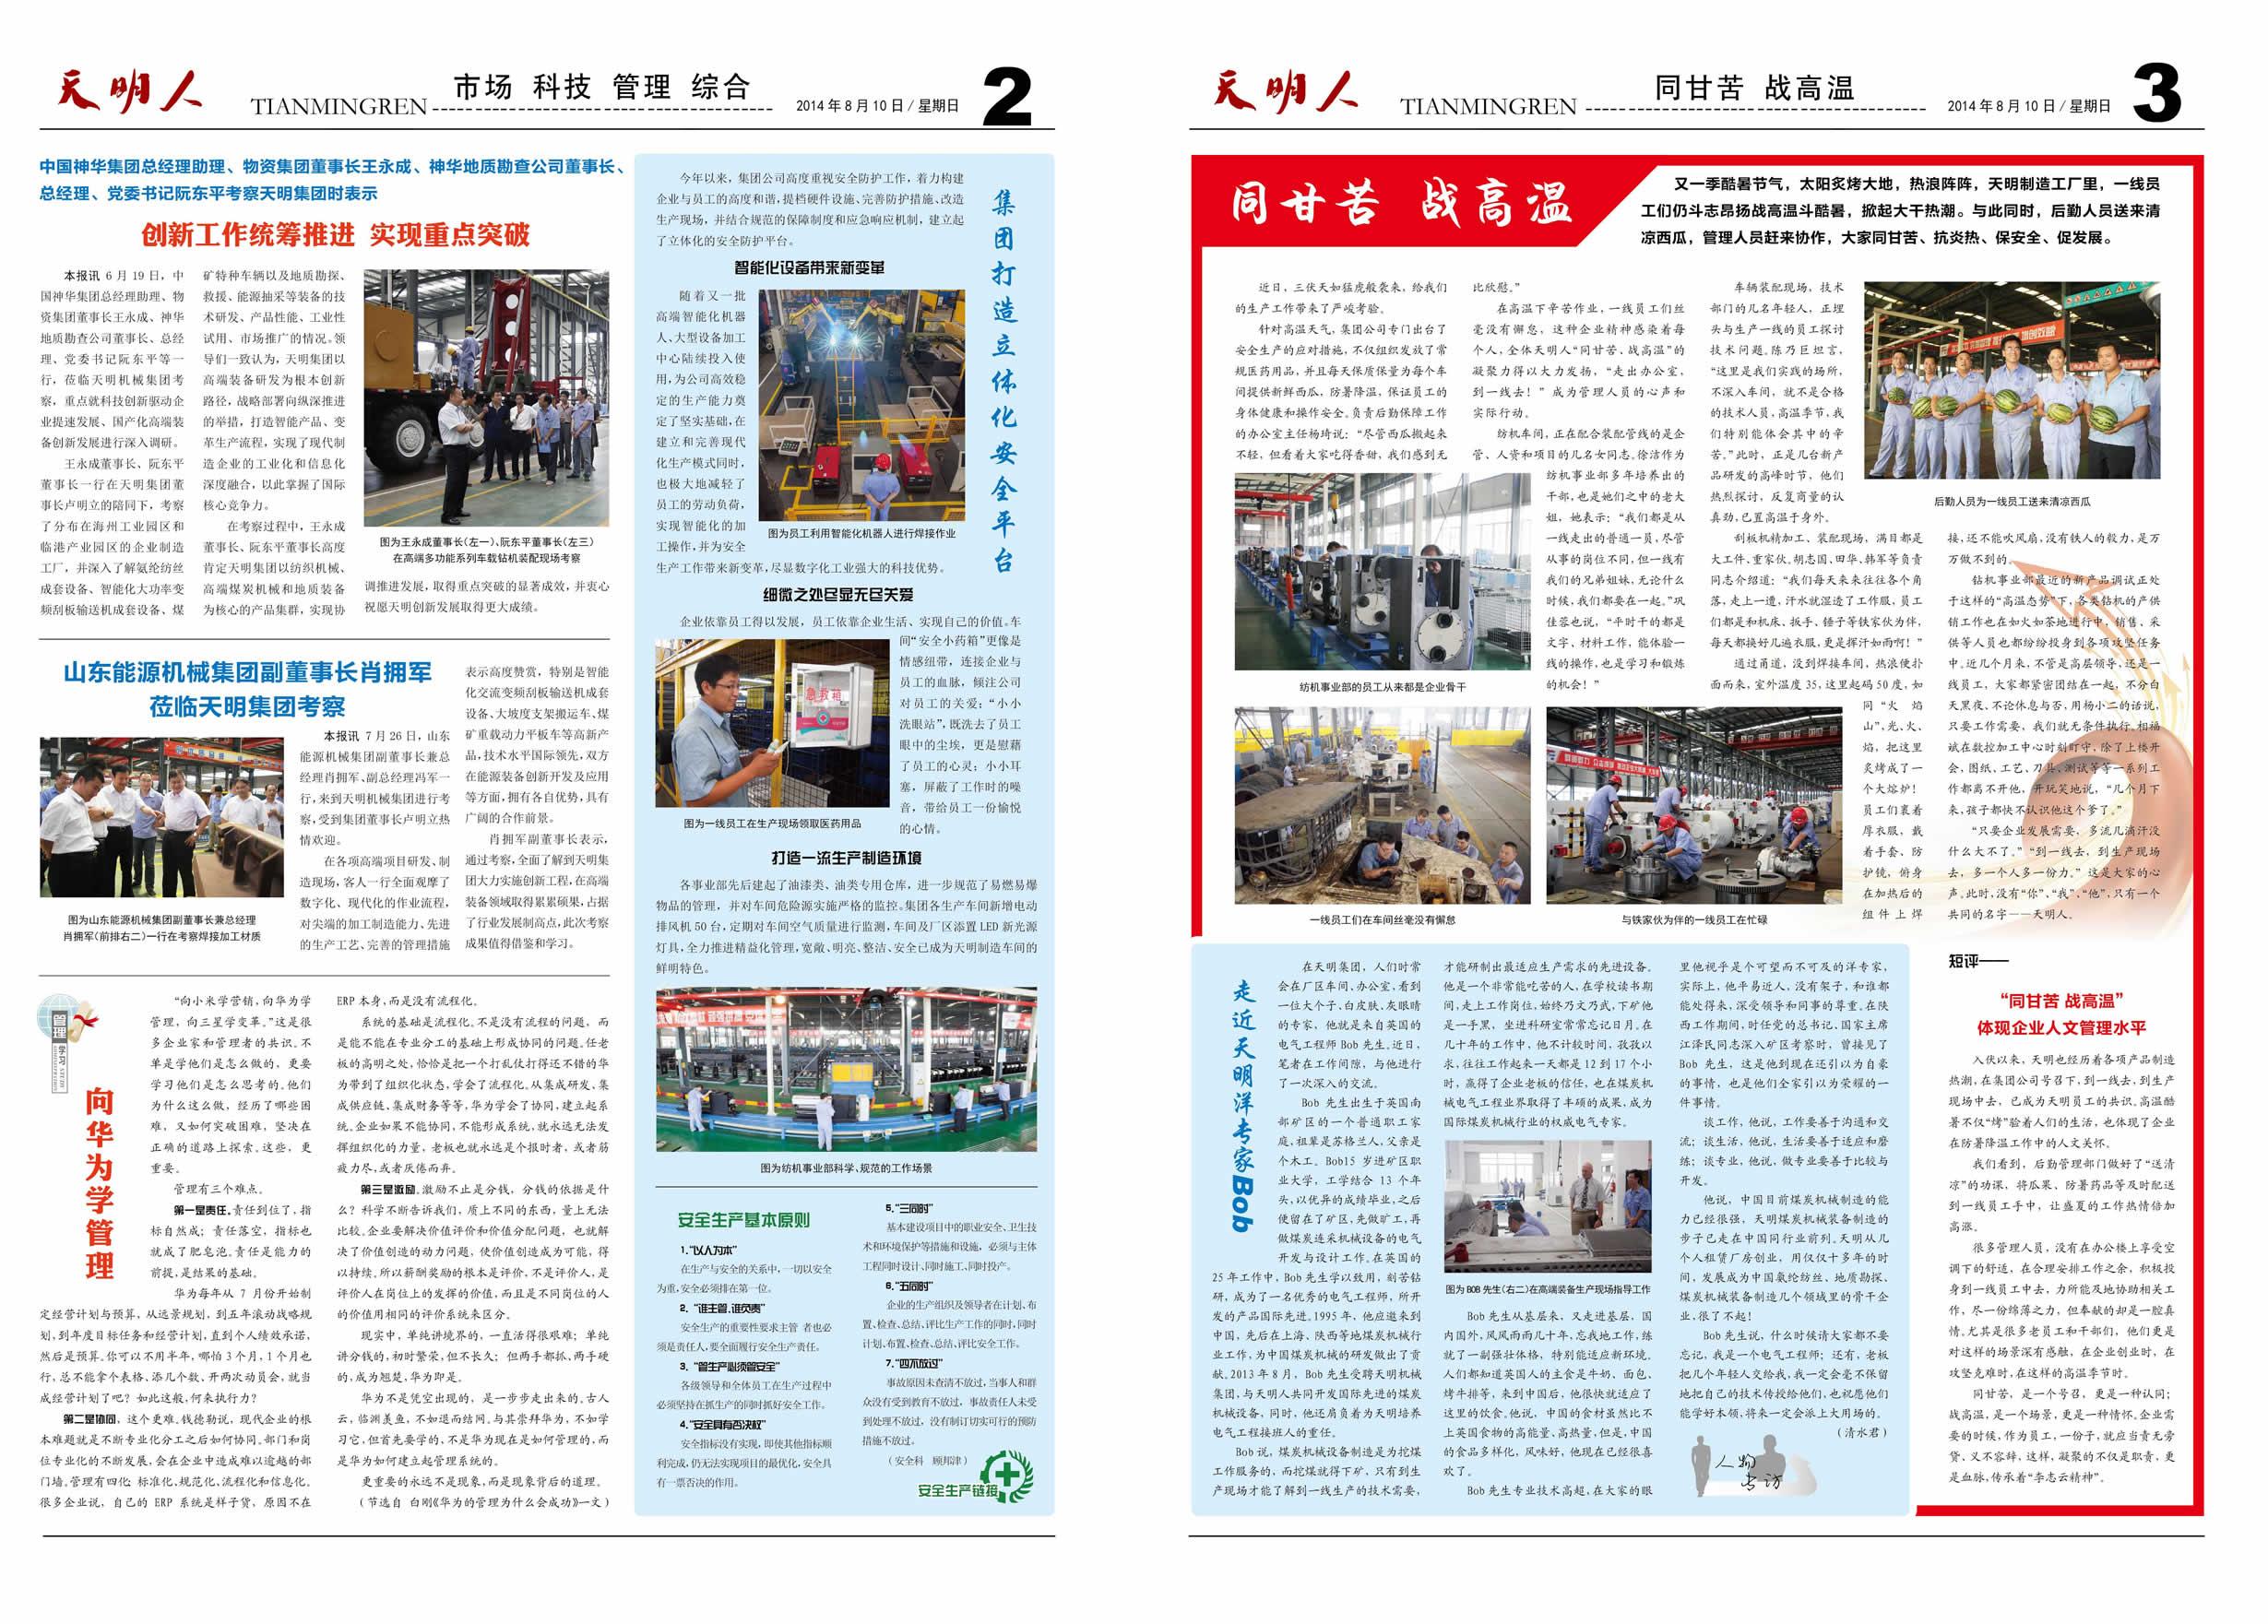 hg711皇冠国际_hg88皇冠国际平台_hg皇冠国际vip首页人2014第08期(总第83期)2、3版